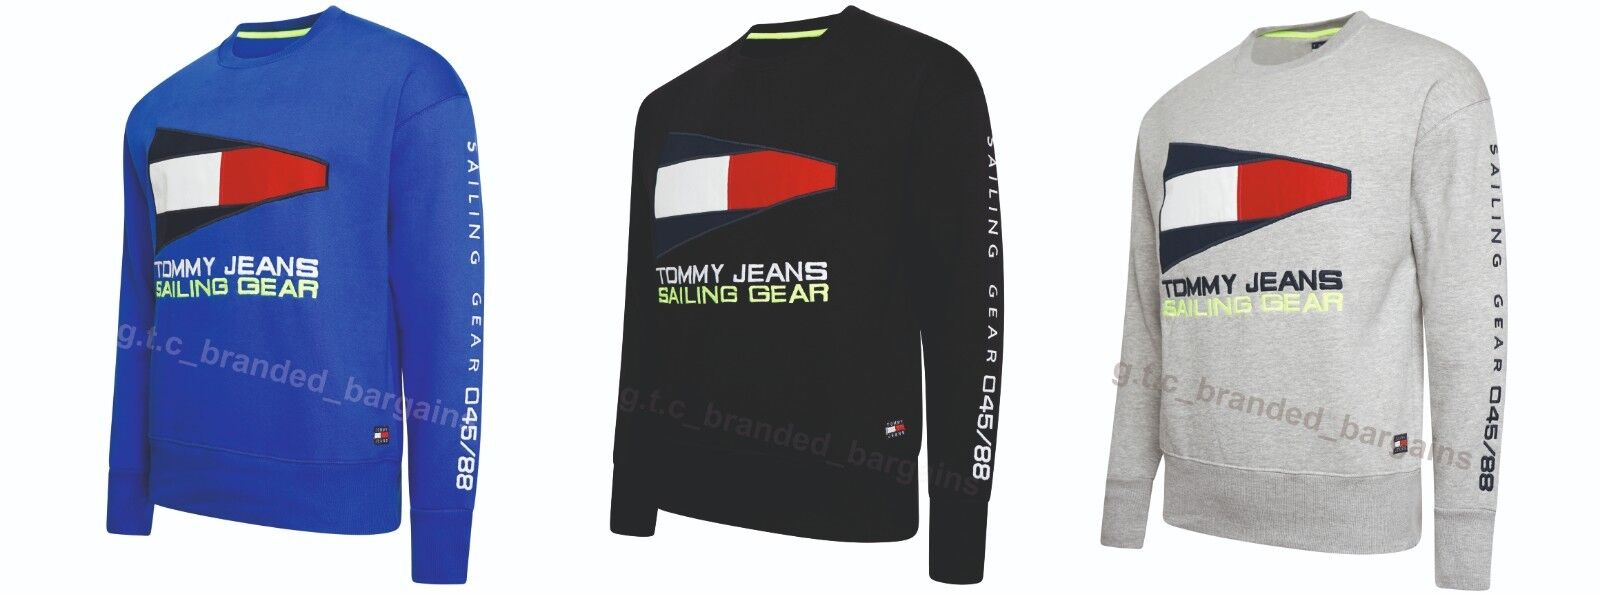 ebe52cab Details about Tommy Hilfiger Sailing Gear 90s Jeans Logo Sweatshirt Black  Grey Royal SMLXL